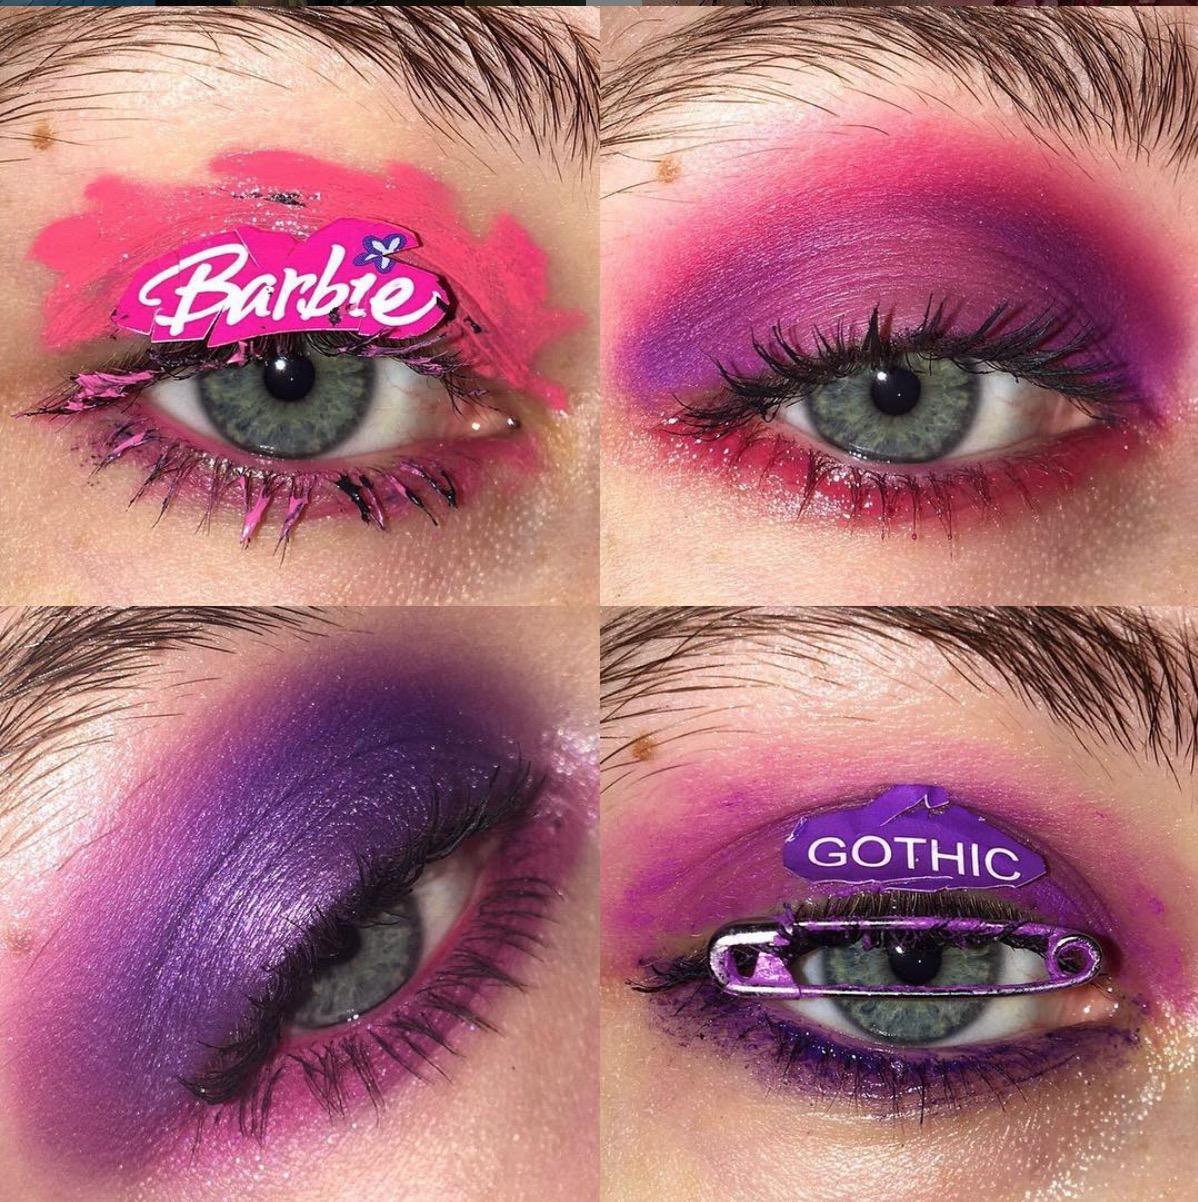 make-up-artist-sofie-petersen-piloupilou-1